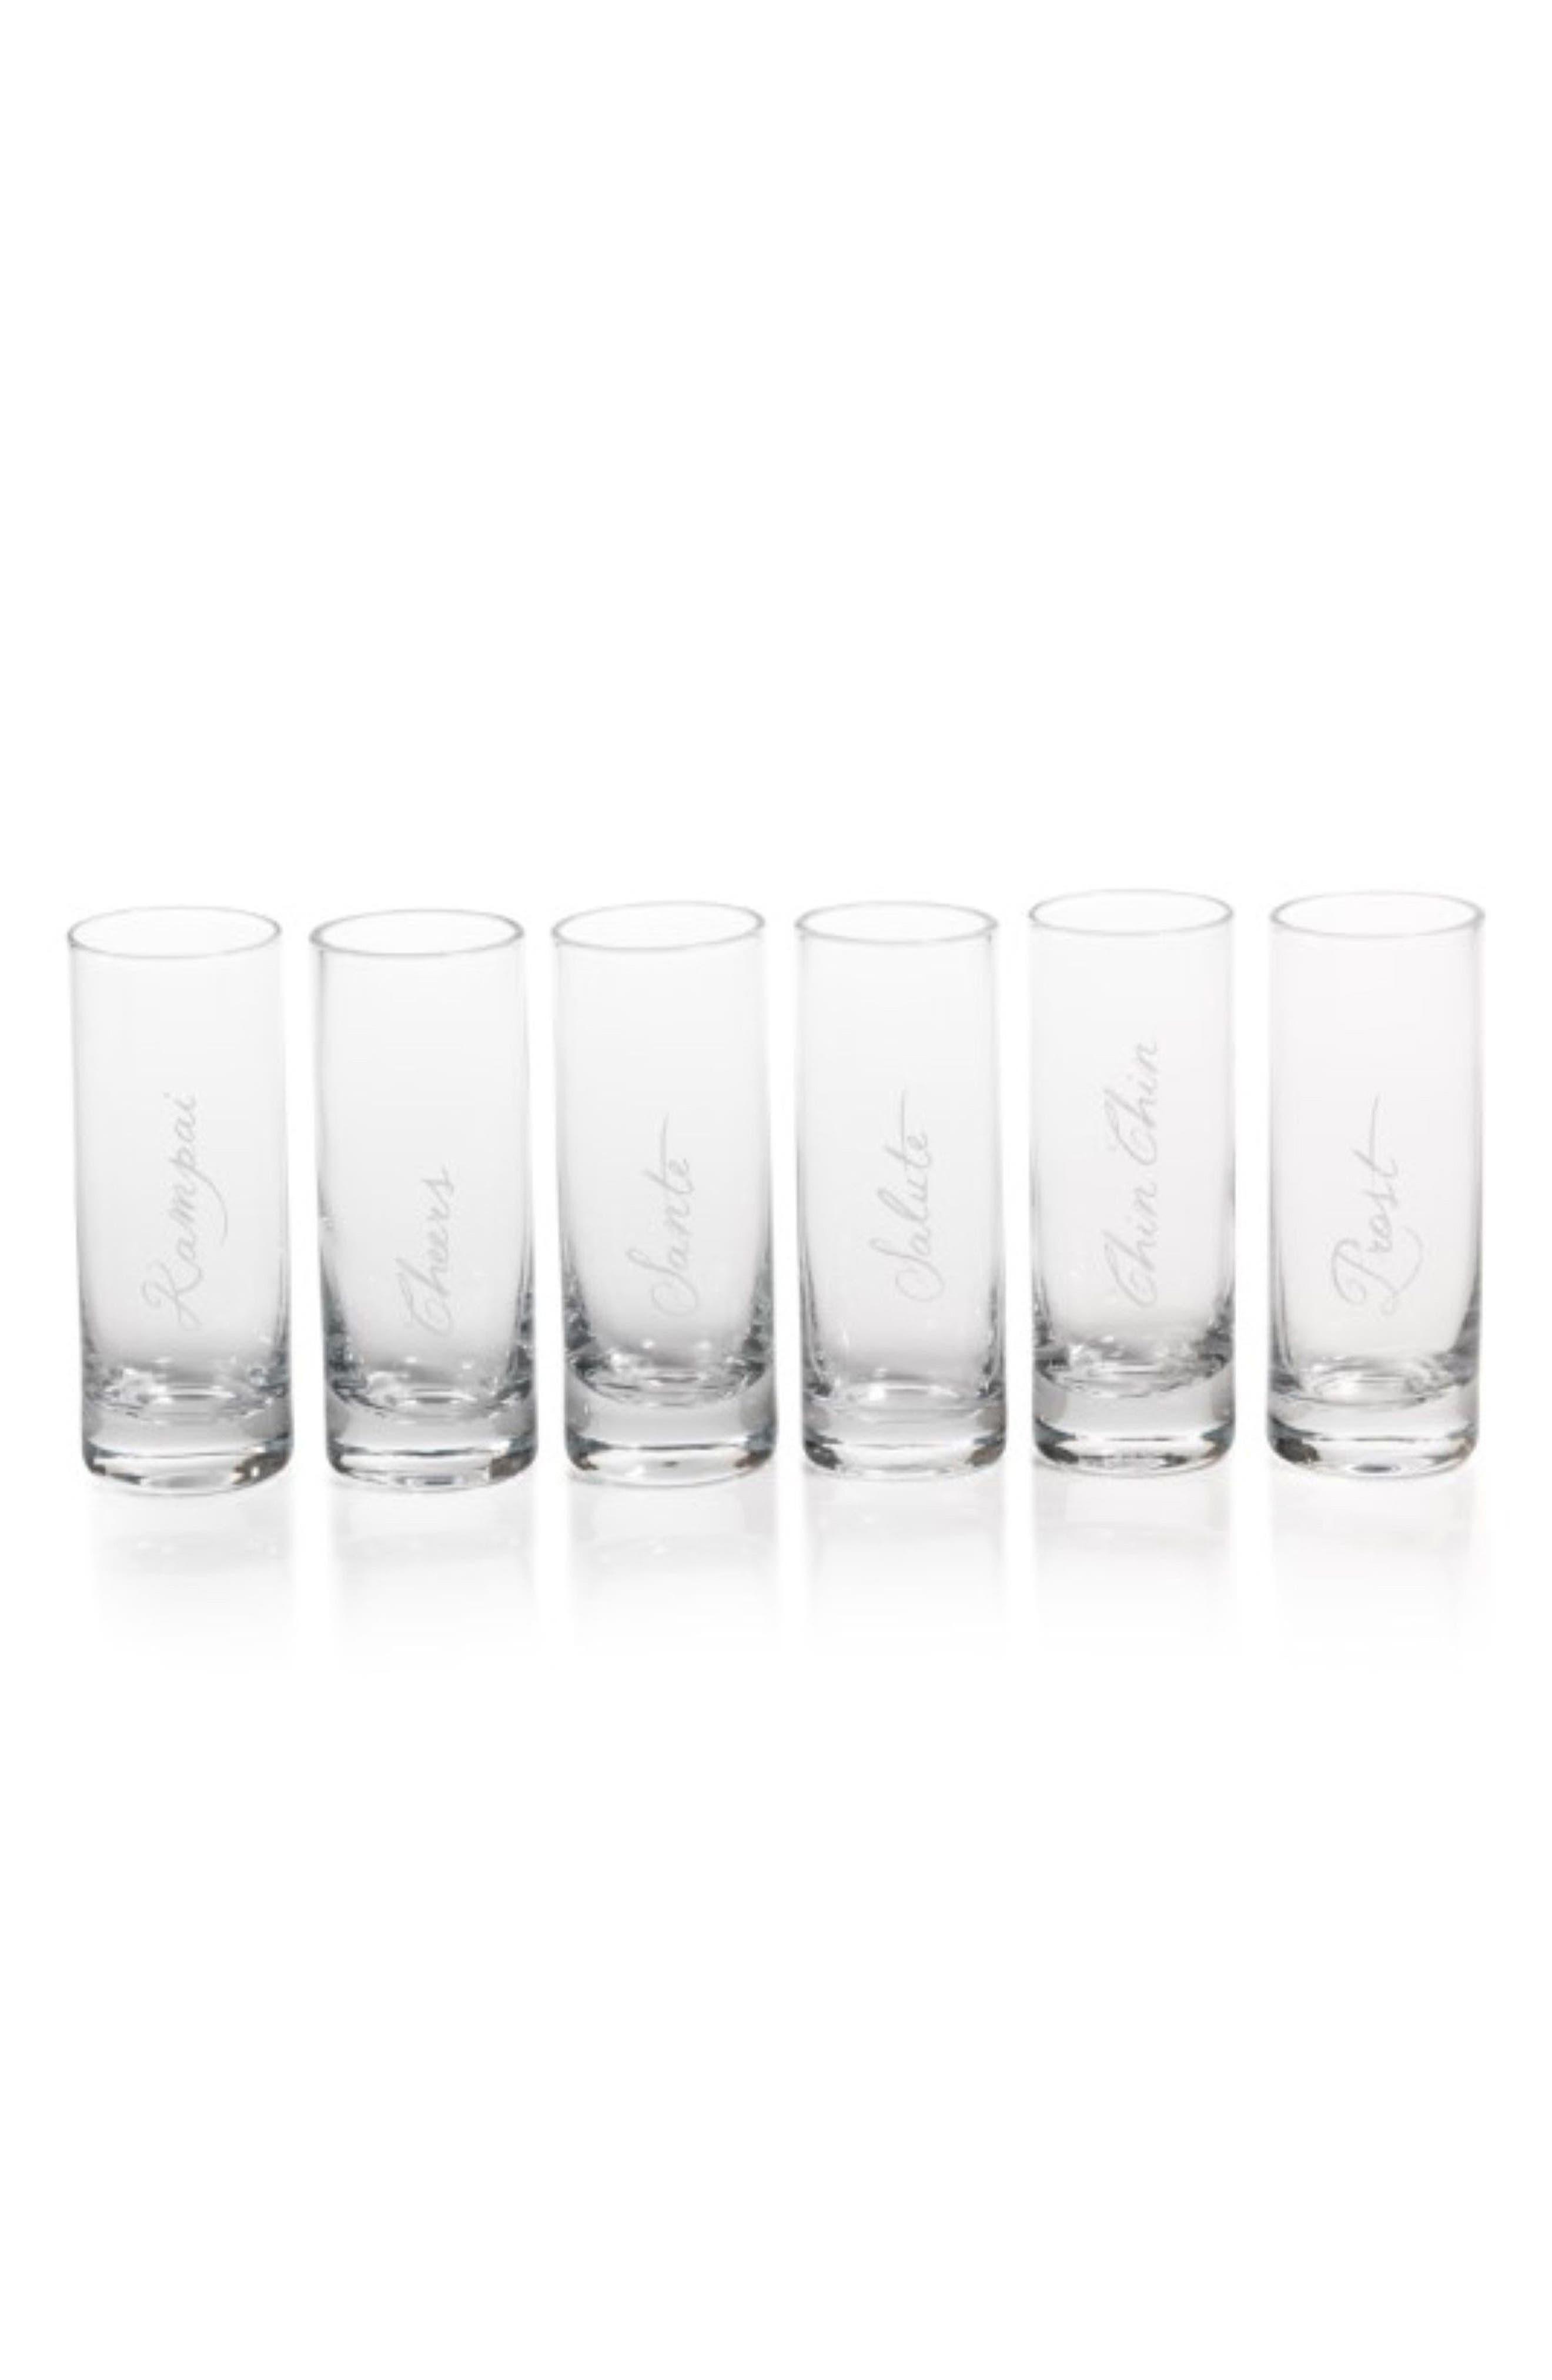 Tula Celebration Set of 6 Shot Glasses,                         Main,                         color, Clear